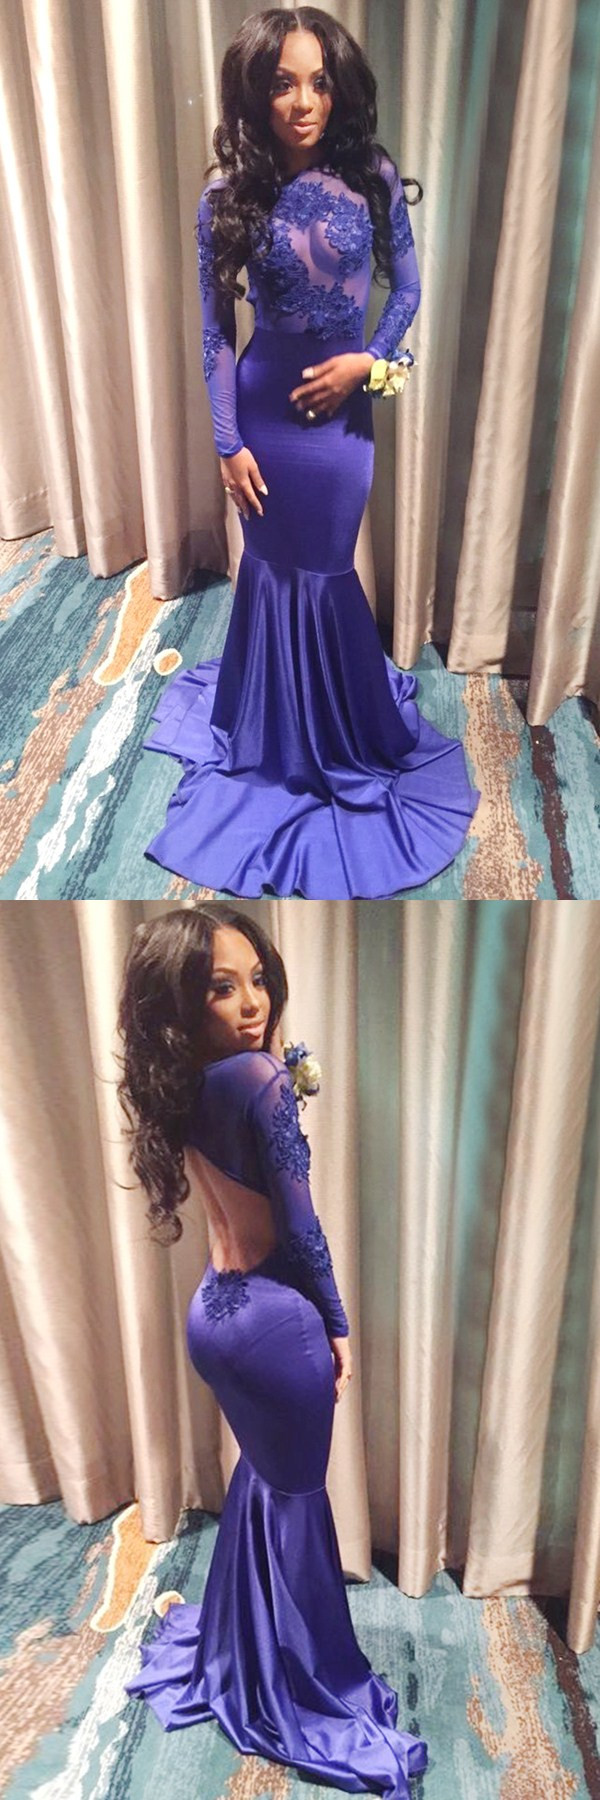 Prom dresses long levees open back purple dresses fashion